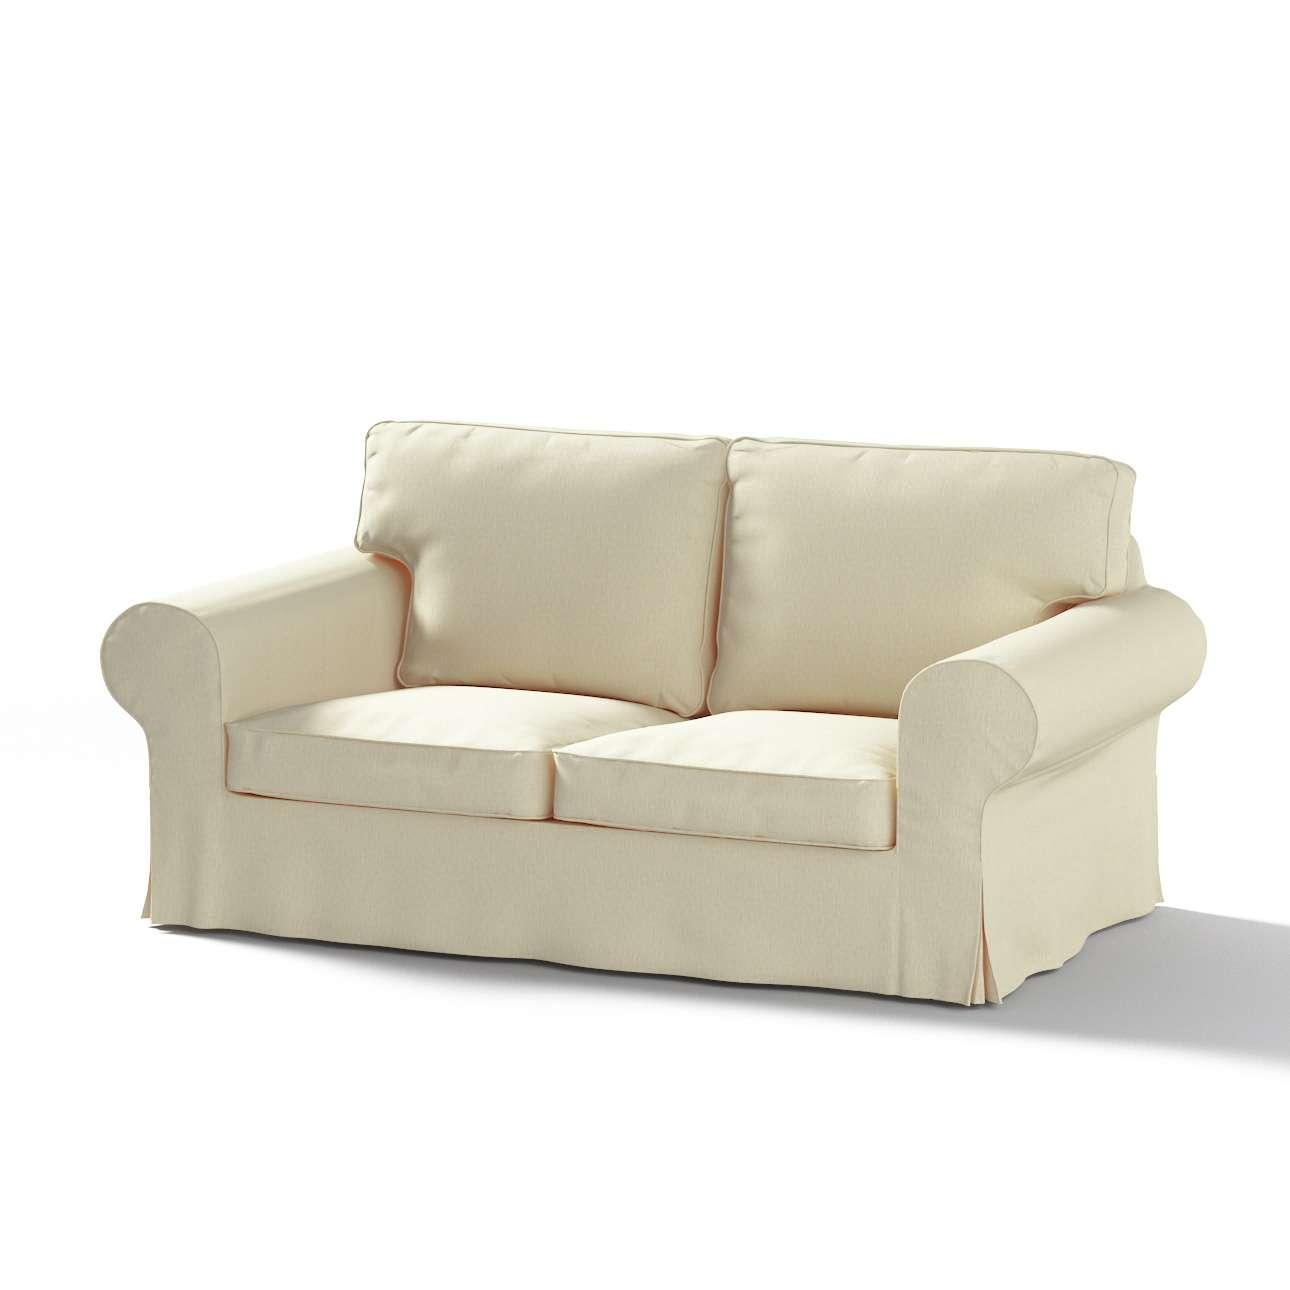 Ektorp 2-Sitzer Schlafsofabezug  ALTES Modell Sofabezug Ektorp 2-Sitzer Schlafsofa altes Modell von der Kollektion Chenille , Stoff: 702-22